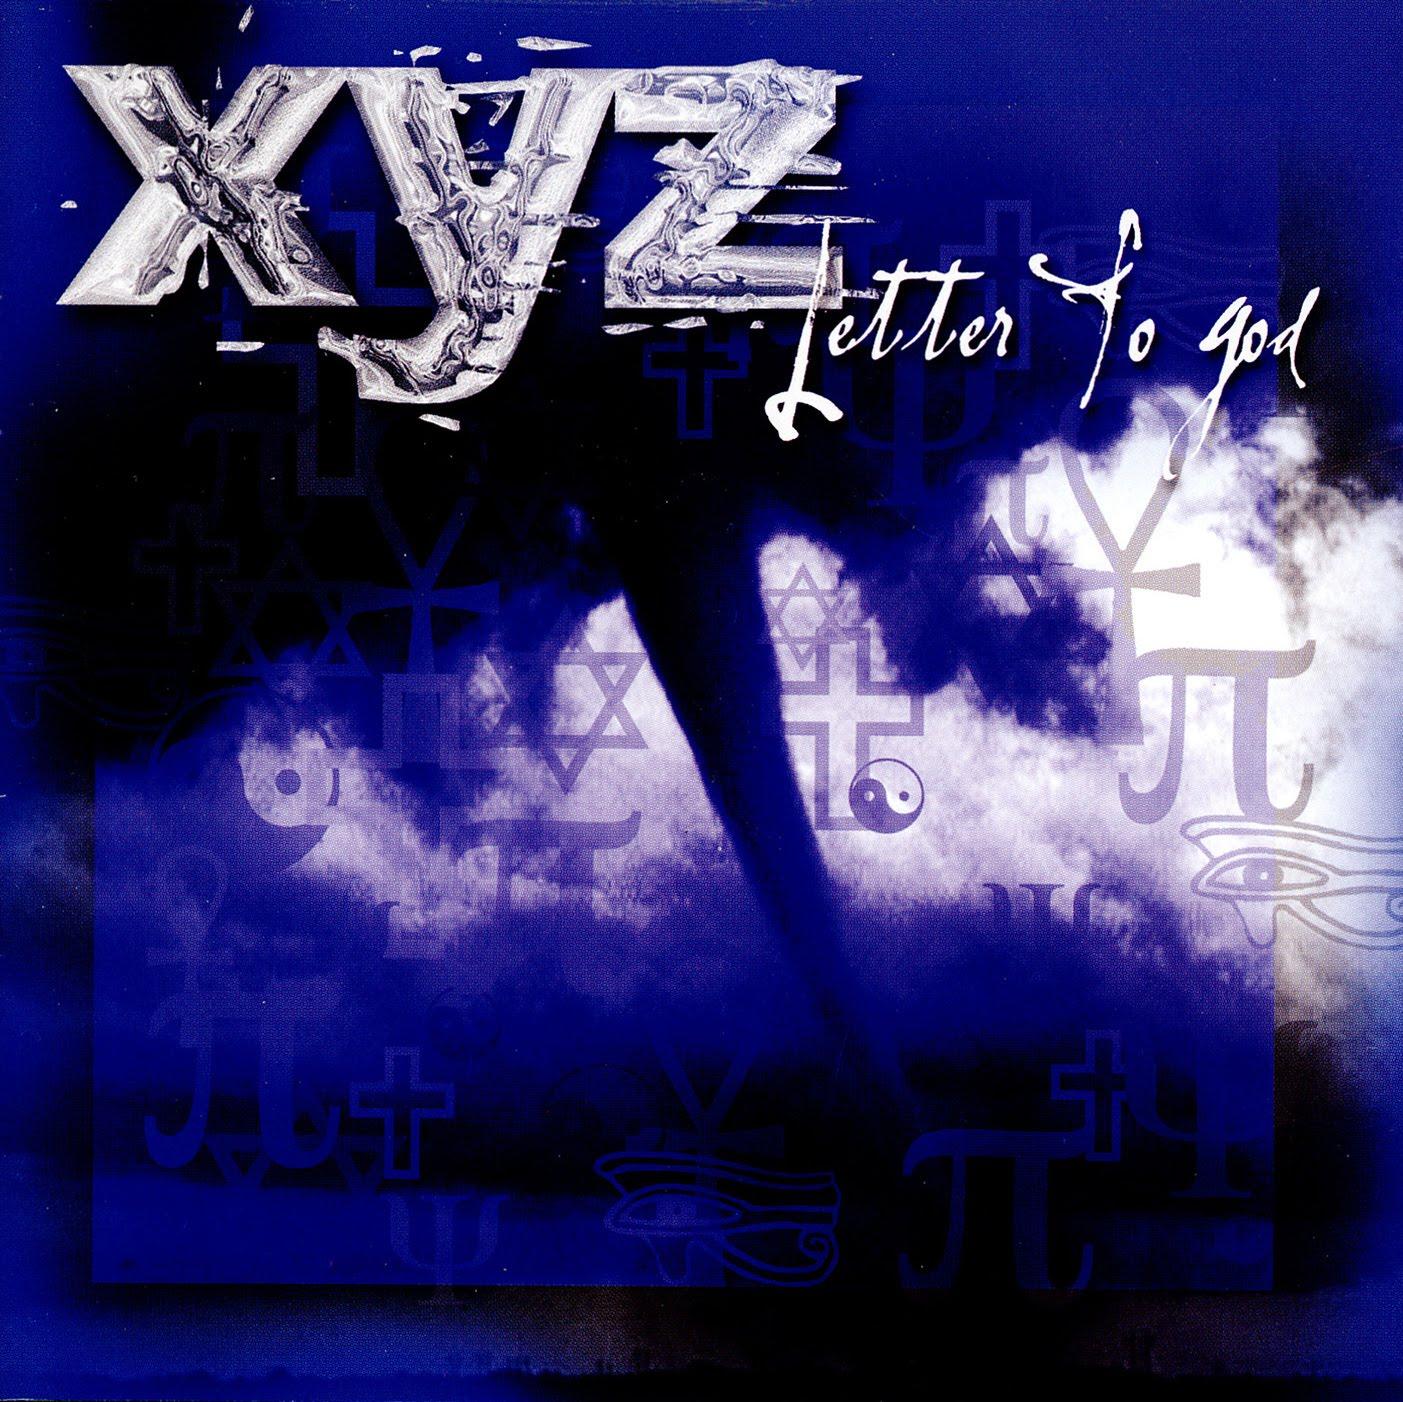 XYZ - Letter To God (2003)